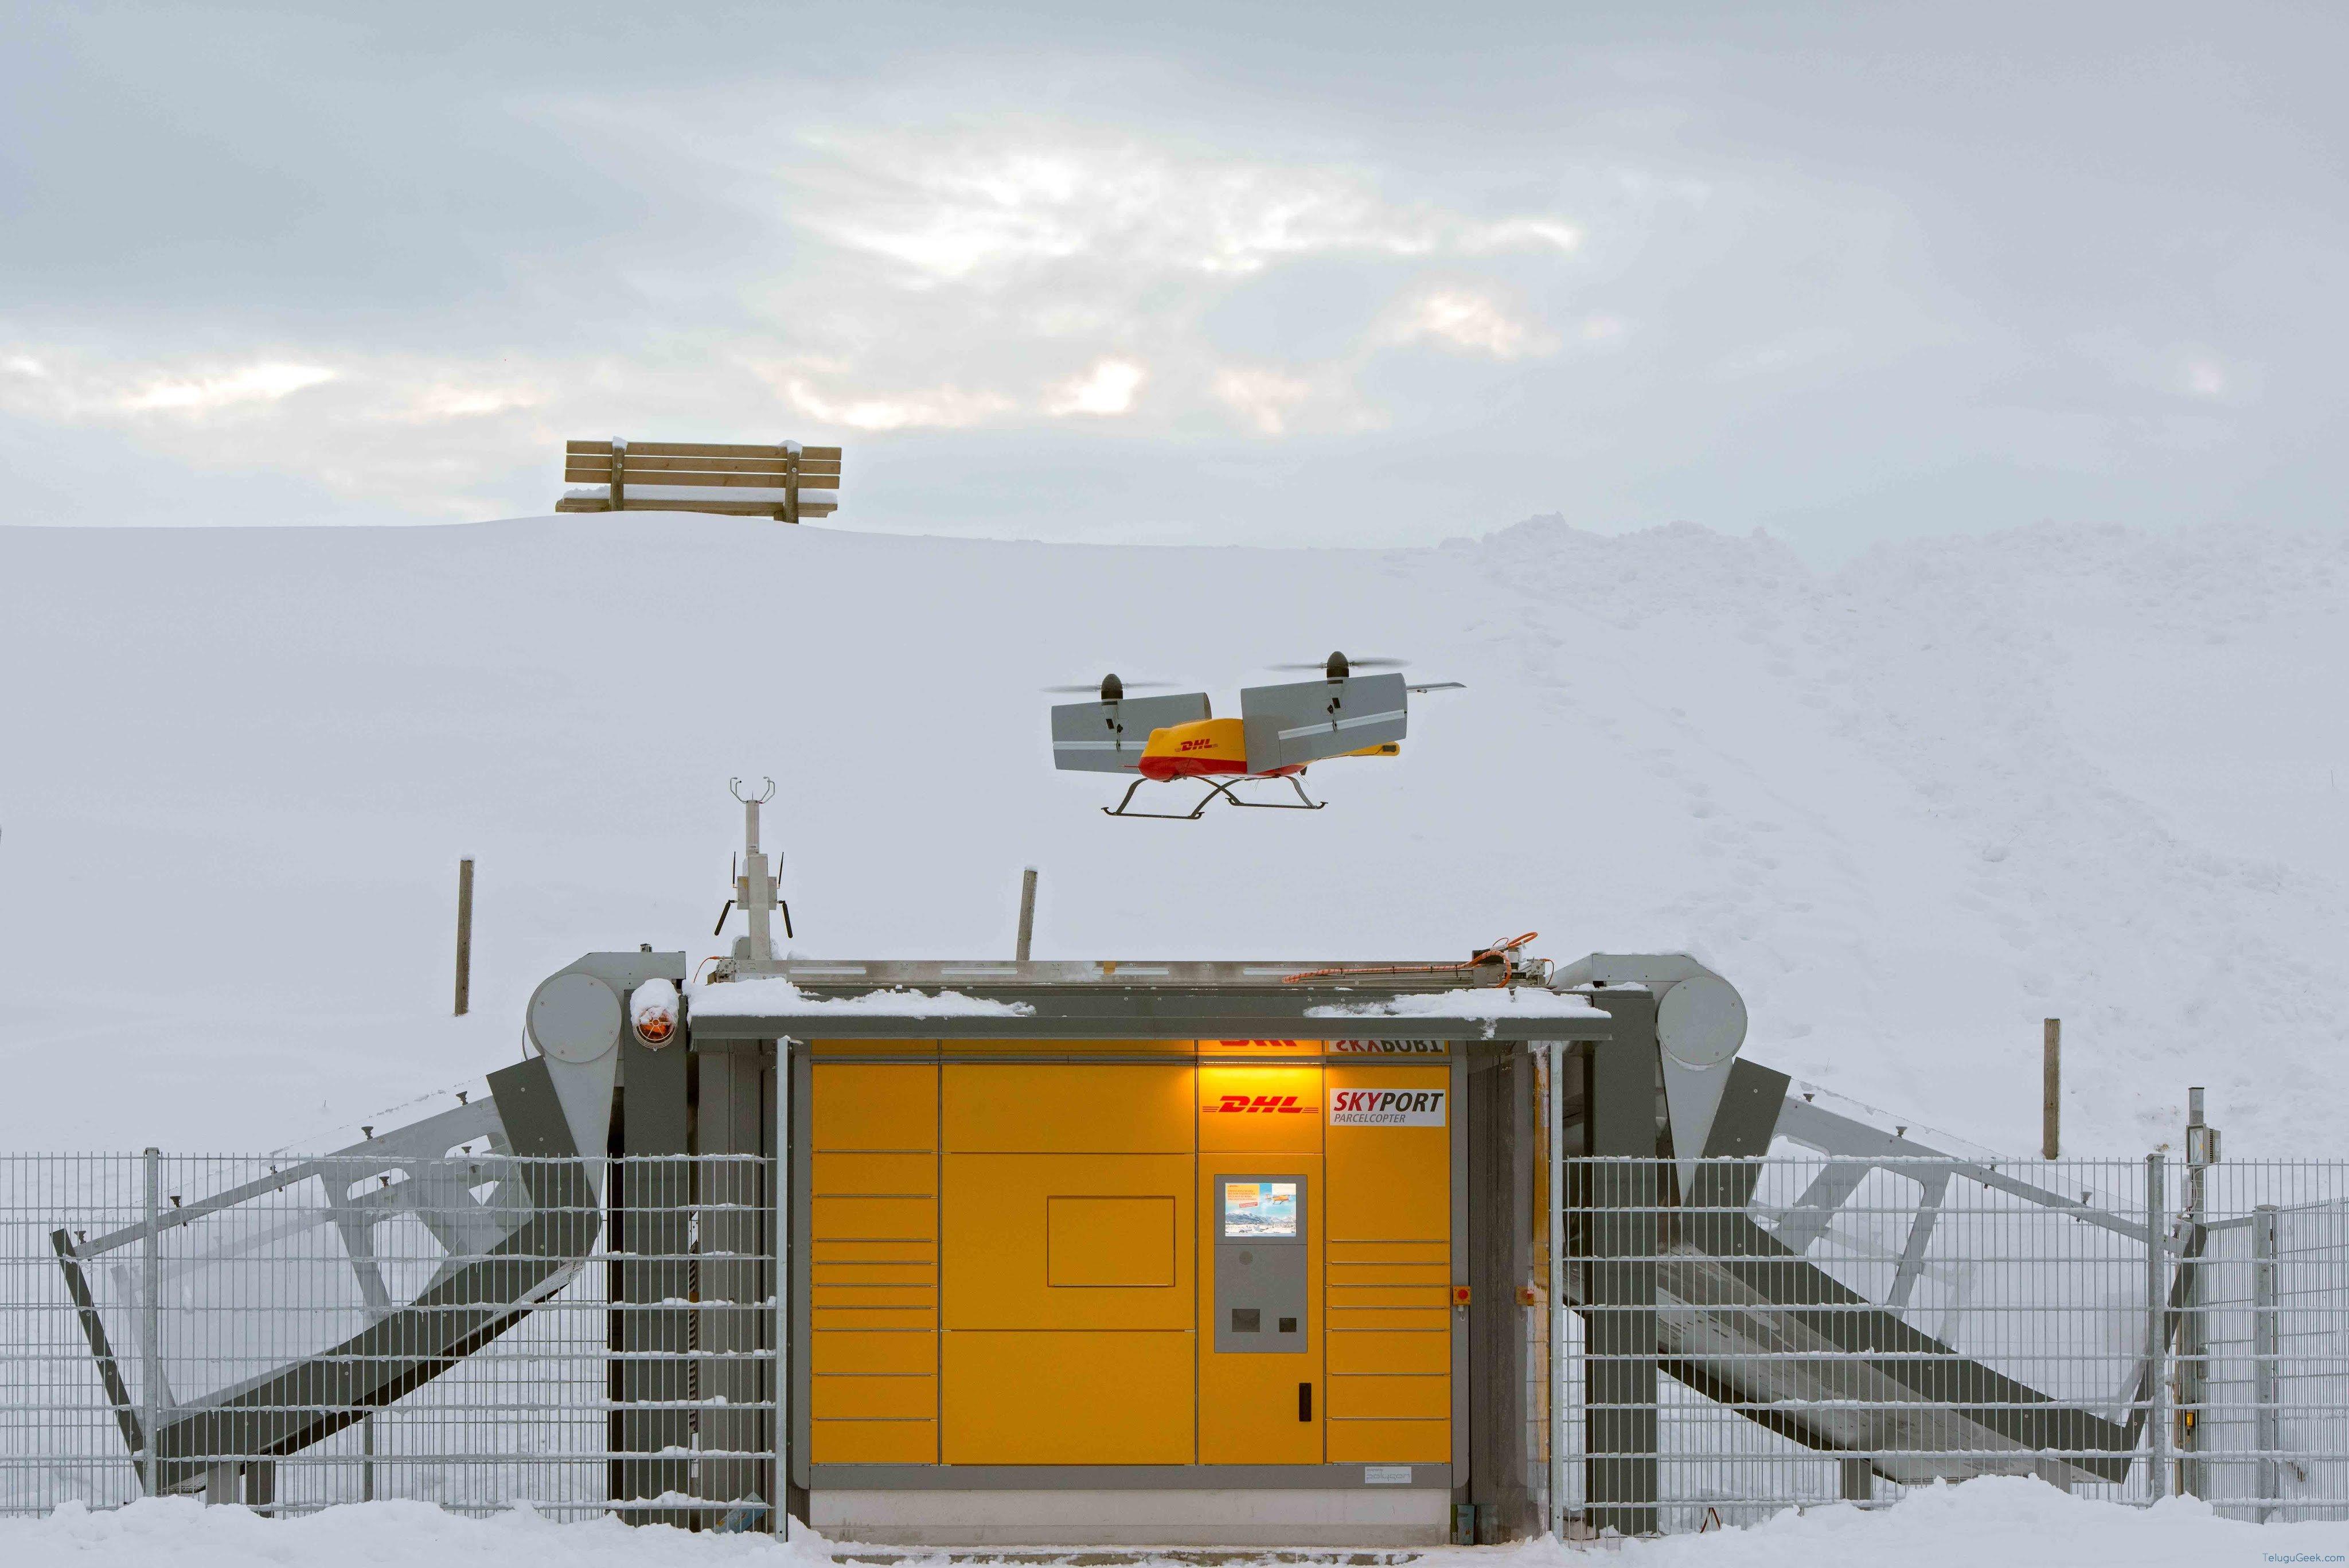 DHL Parcelcopter 3.0: రవాణా రంగంలో పెను విప్లవానికి దారి తీయనుంది